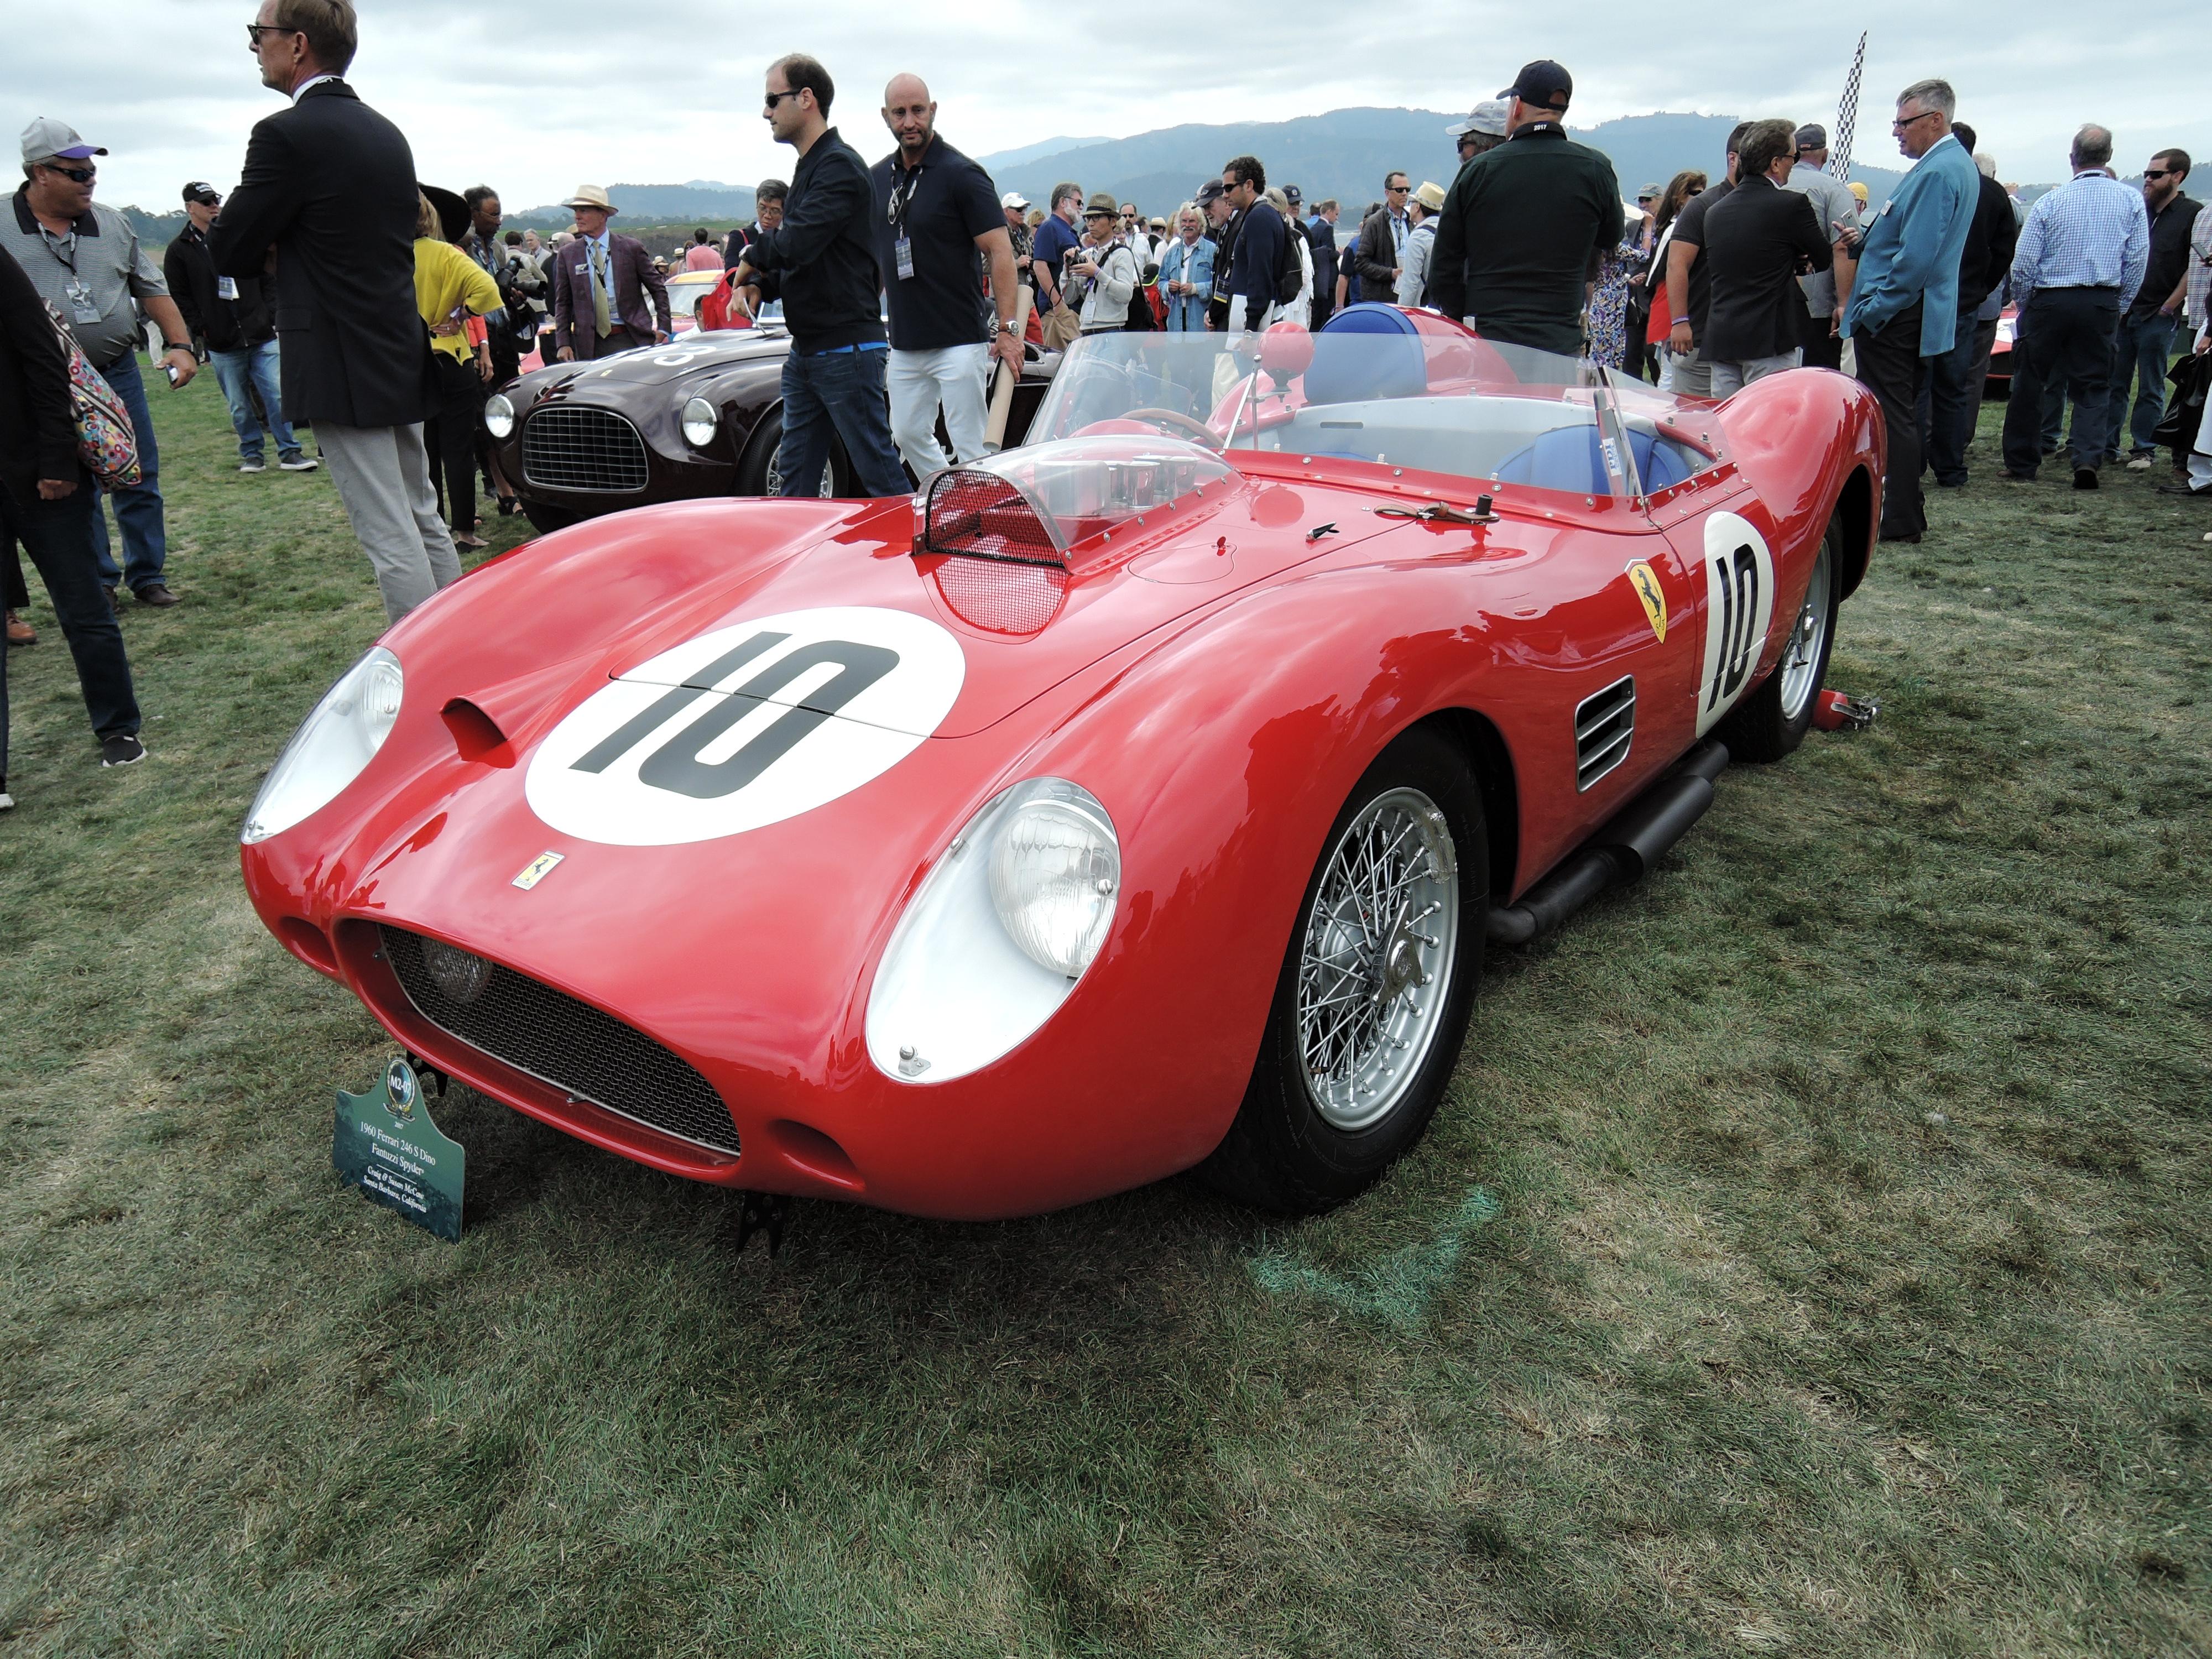 red 1960 Ferrari 246 S Dino Fantuzzi Spyder; Sn 0778 - Pebble Beach Concours d'Elegance 2017